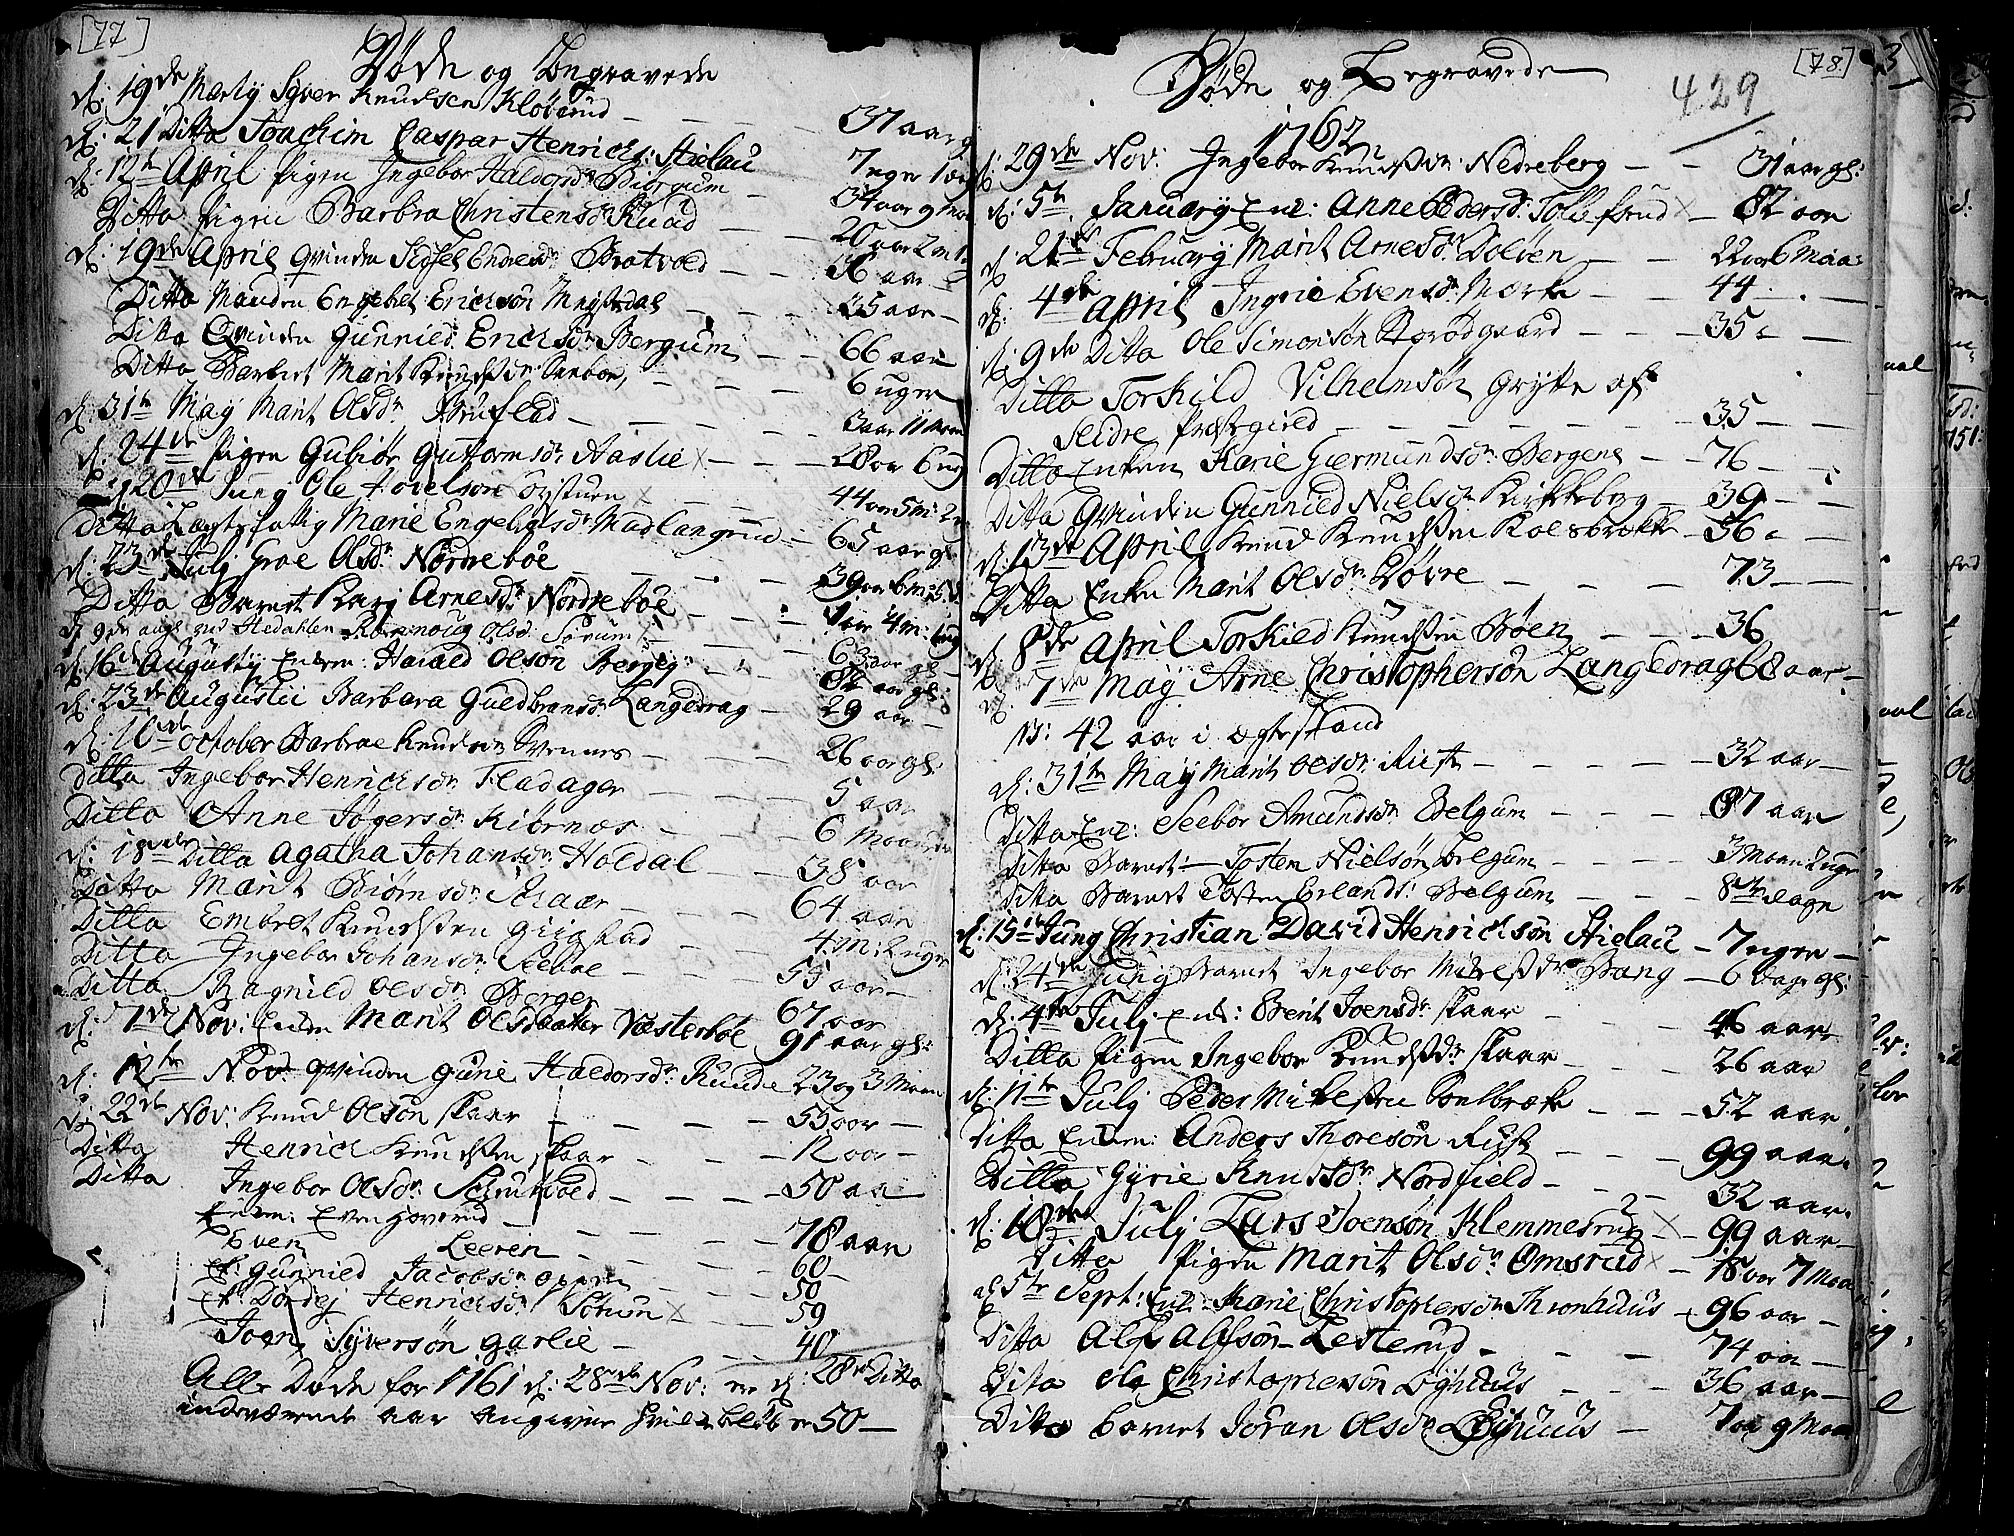 SAH, Aurdal prestekontor, Ministerialbok nr. 4, 1730-1762, s. 77-78